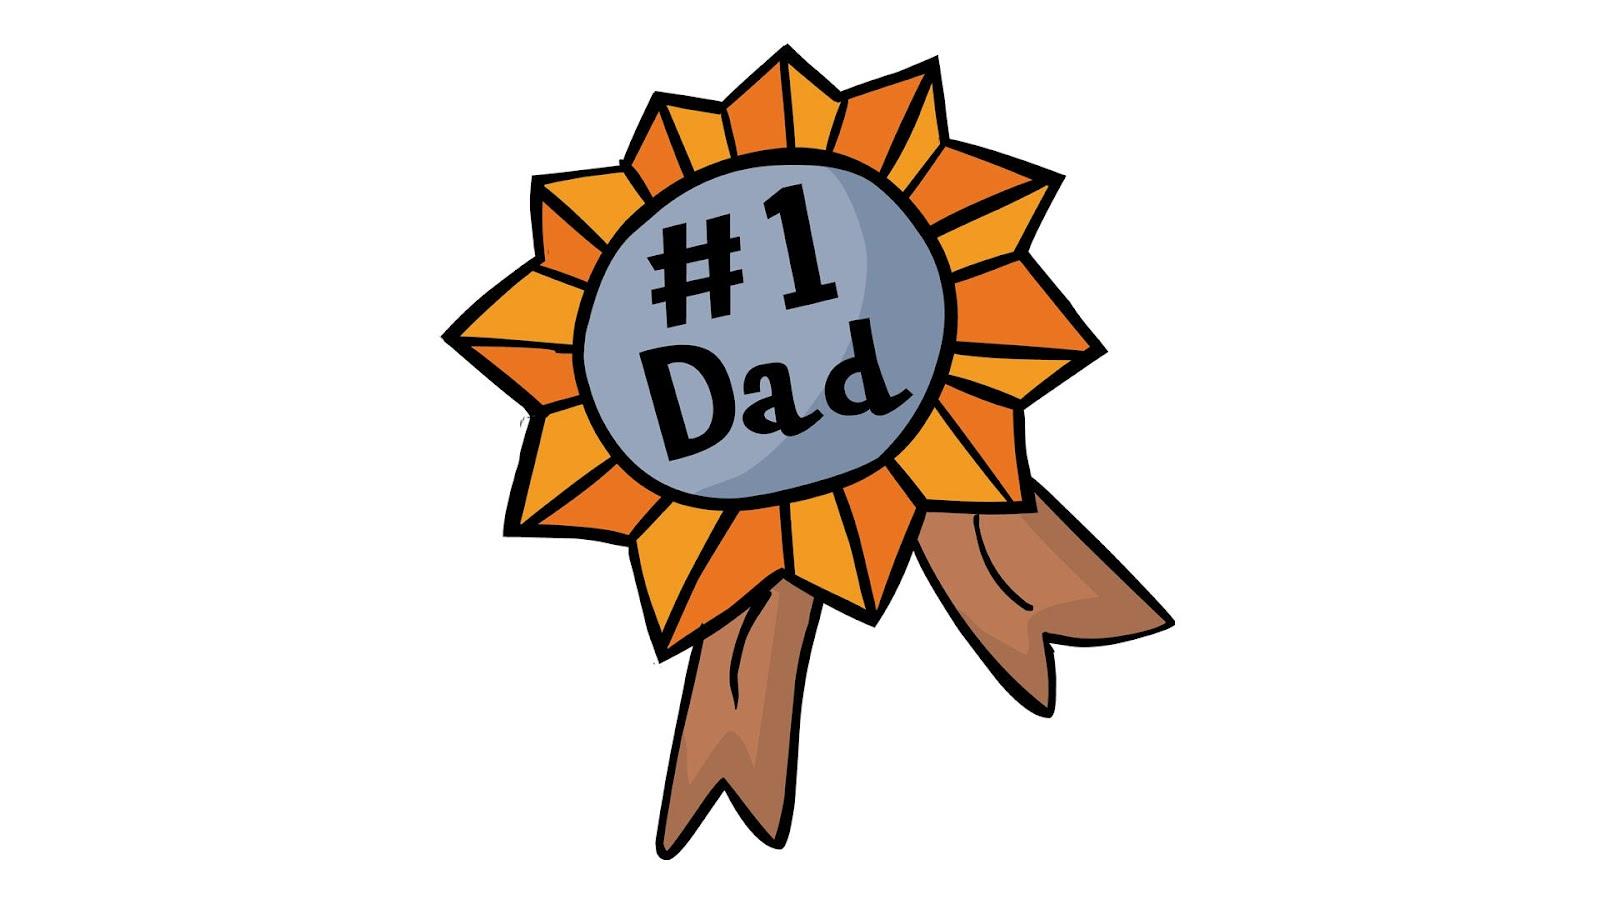 Best Dad Father Day Wallpaper   best dad wallpaper 6   Doblelolcom 1600x900